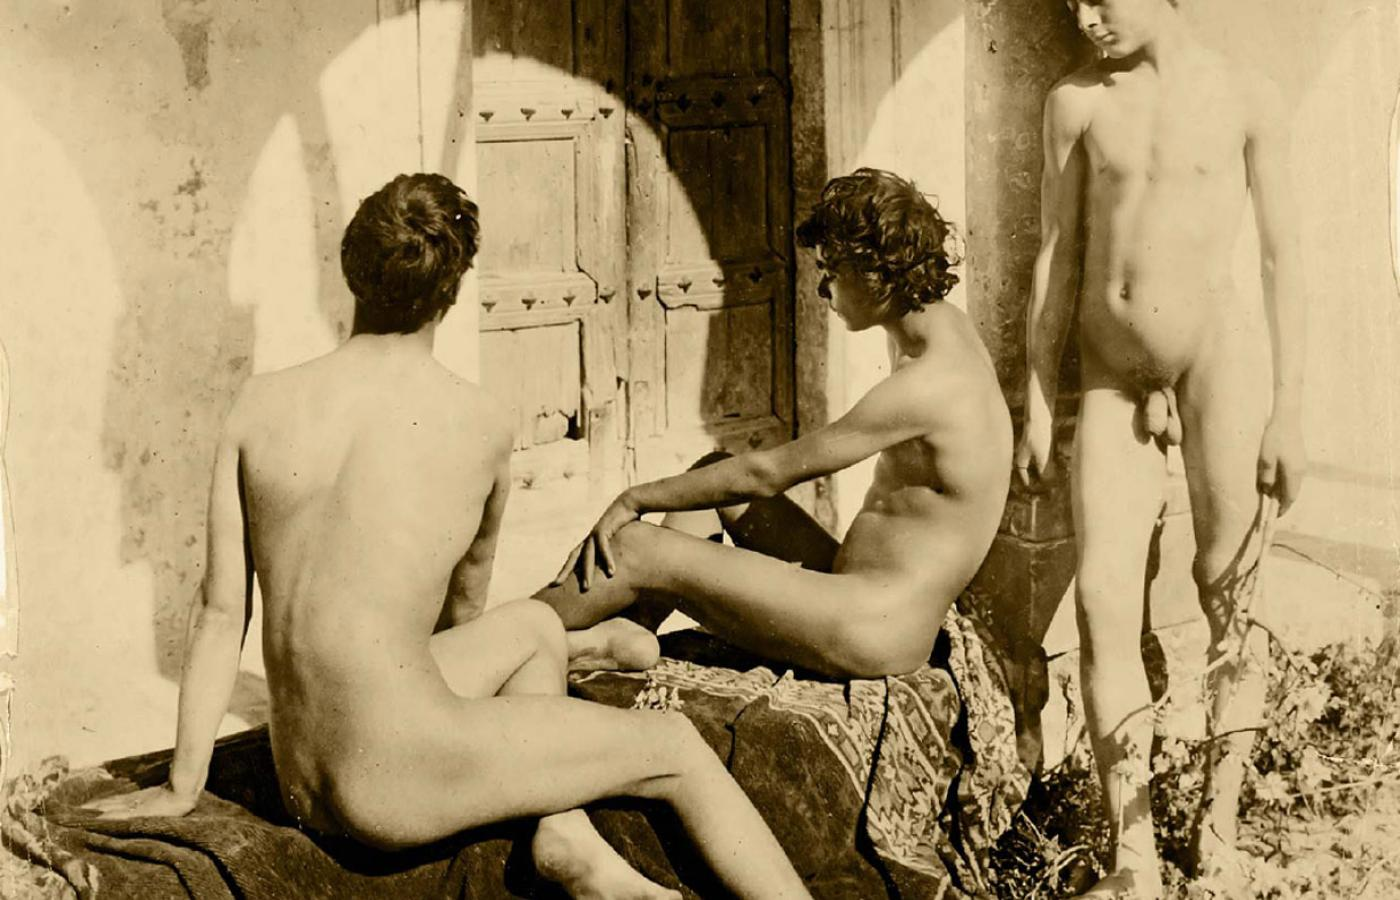 Nudist art boys and girls